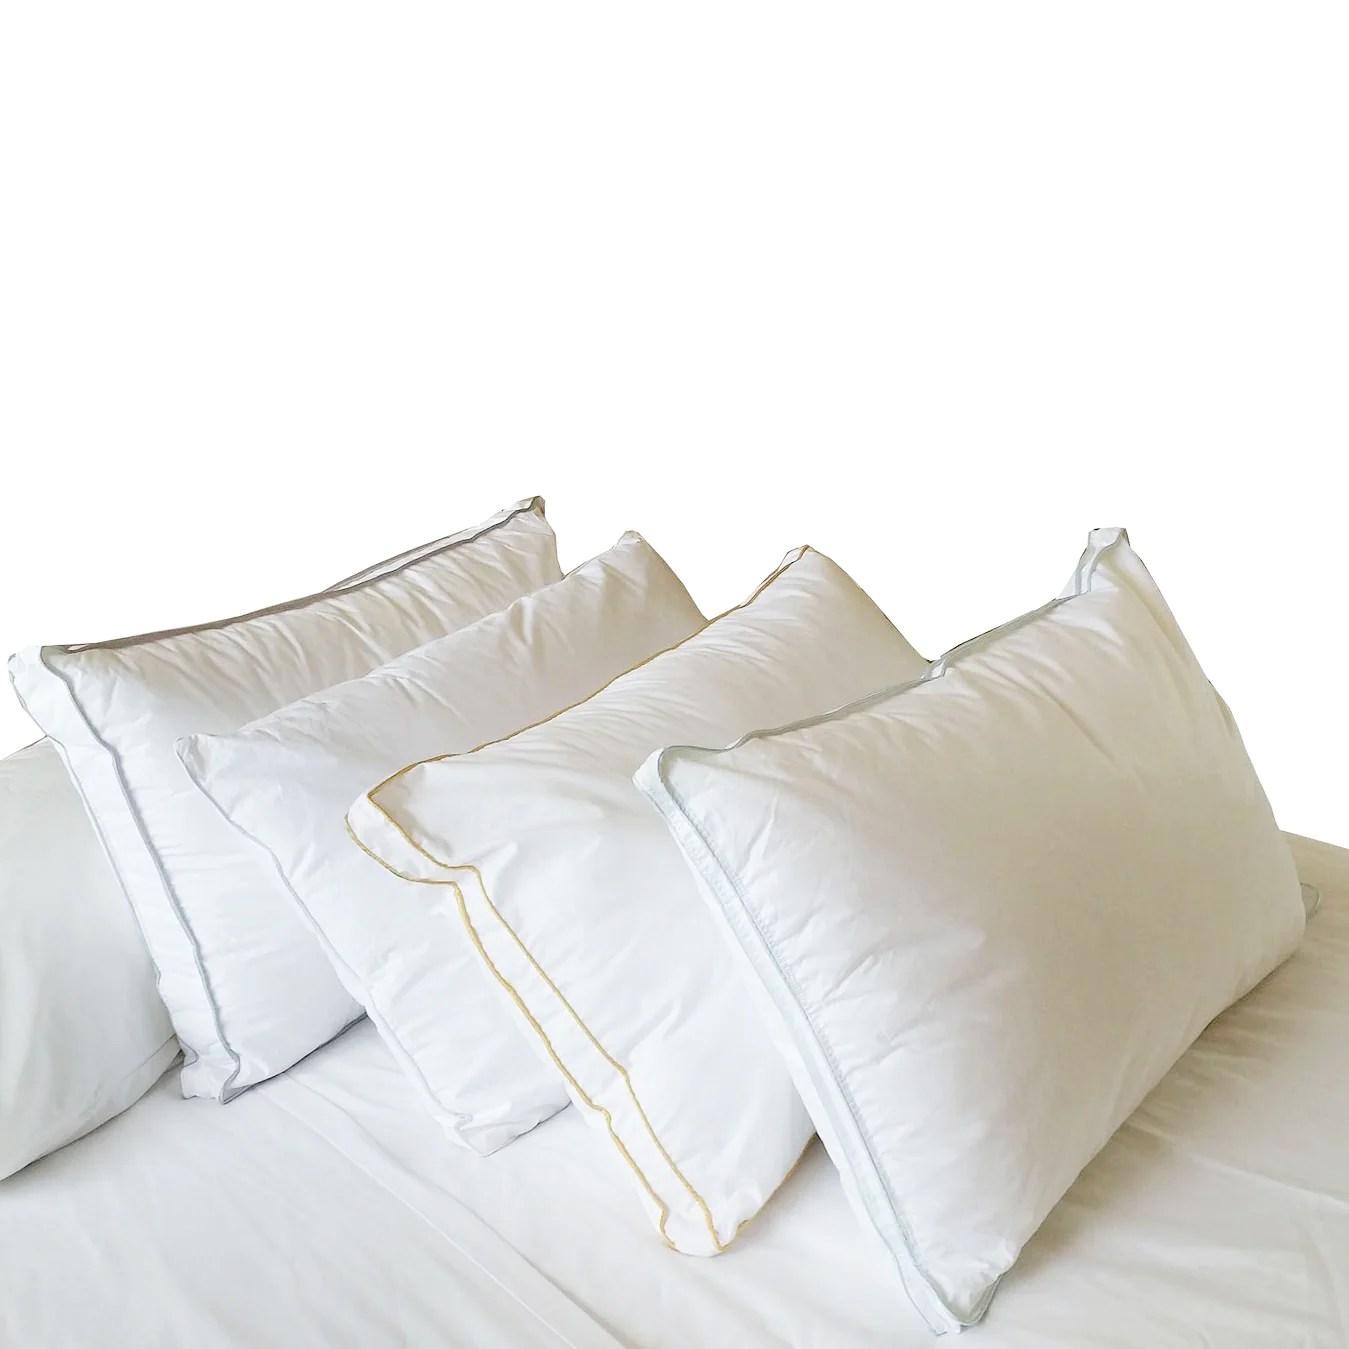 https als net au products medium firm pillow 700gms